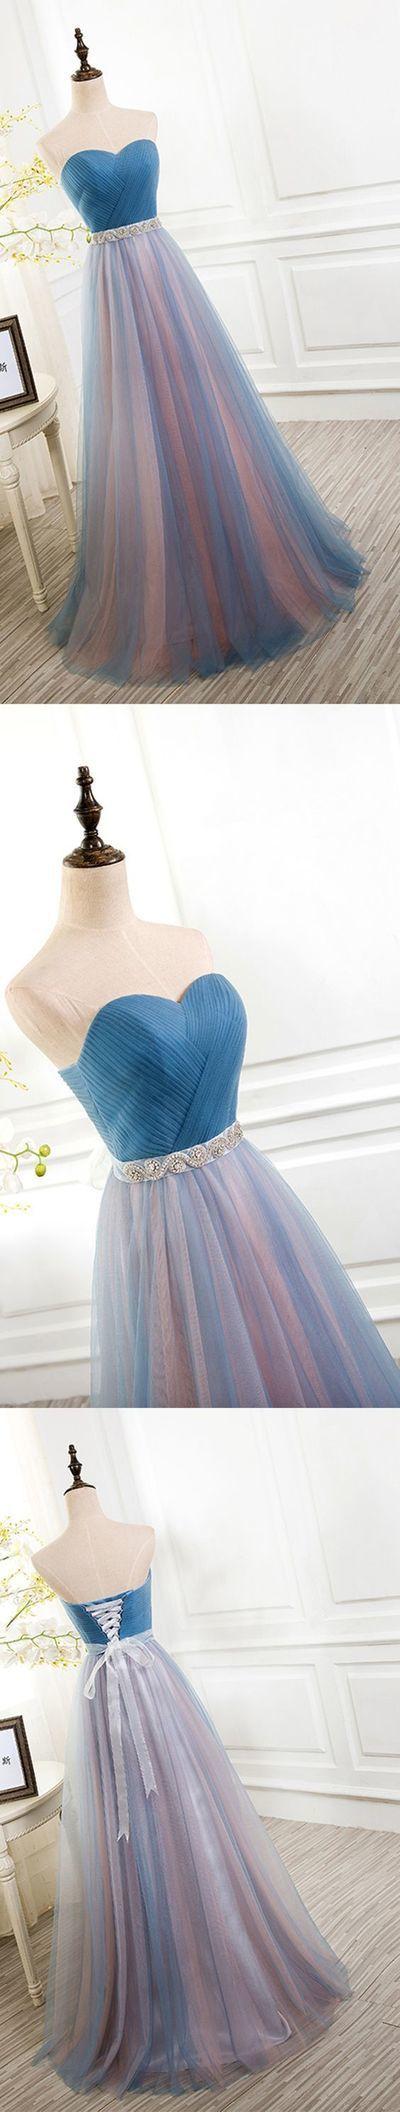 Charming Prom Dress,Elegant Evening Dress,Long Prom Dress,Long Homecoming Dress,